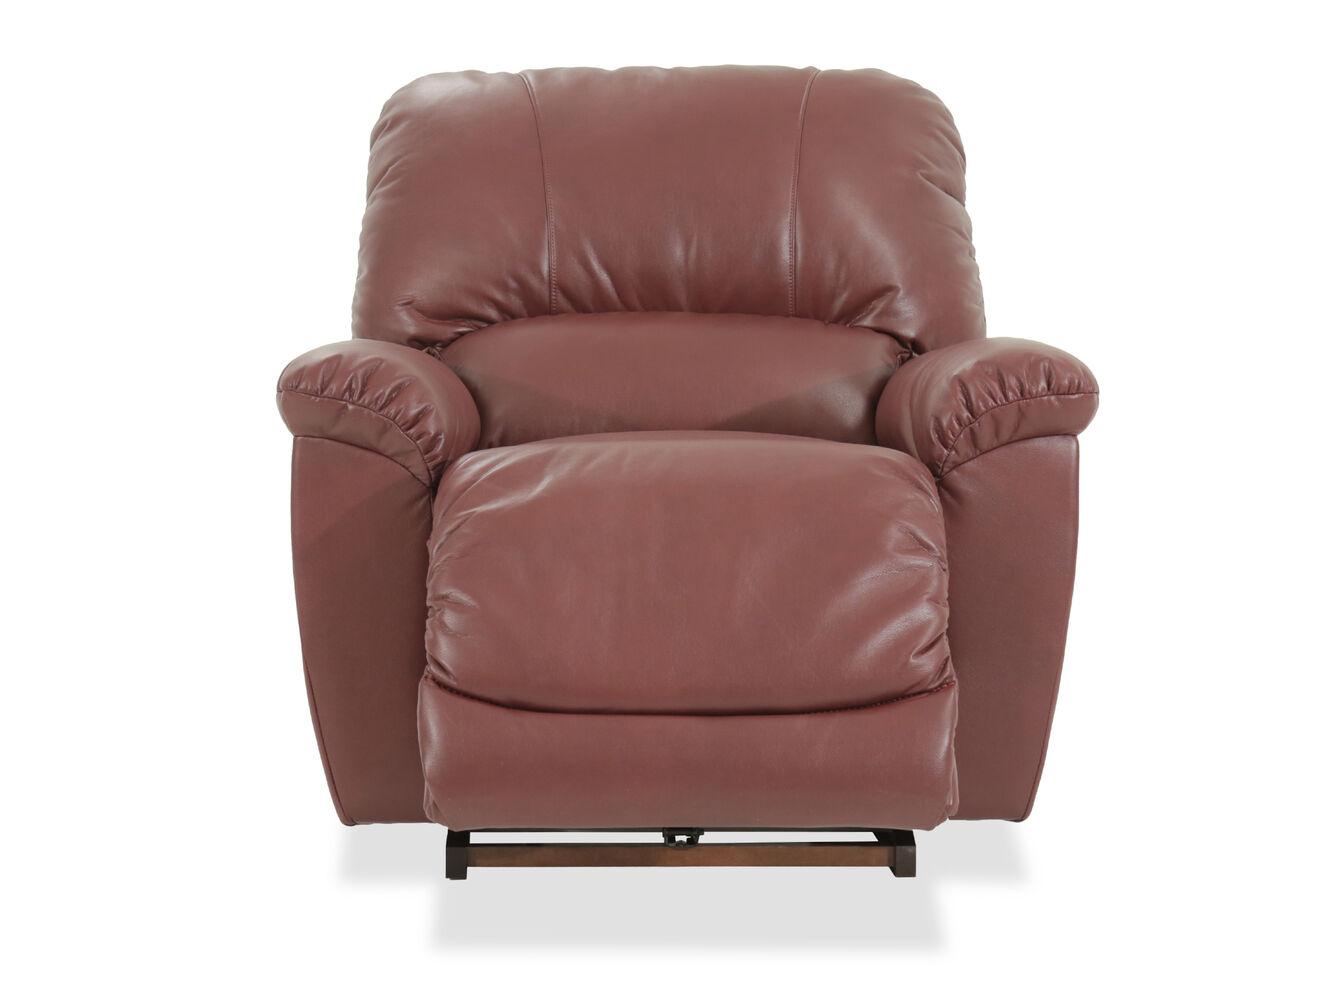 La Z Boy Tyler Red Rocker Recliner Mathis Brothers Furniture